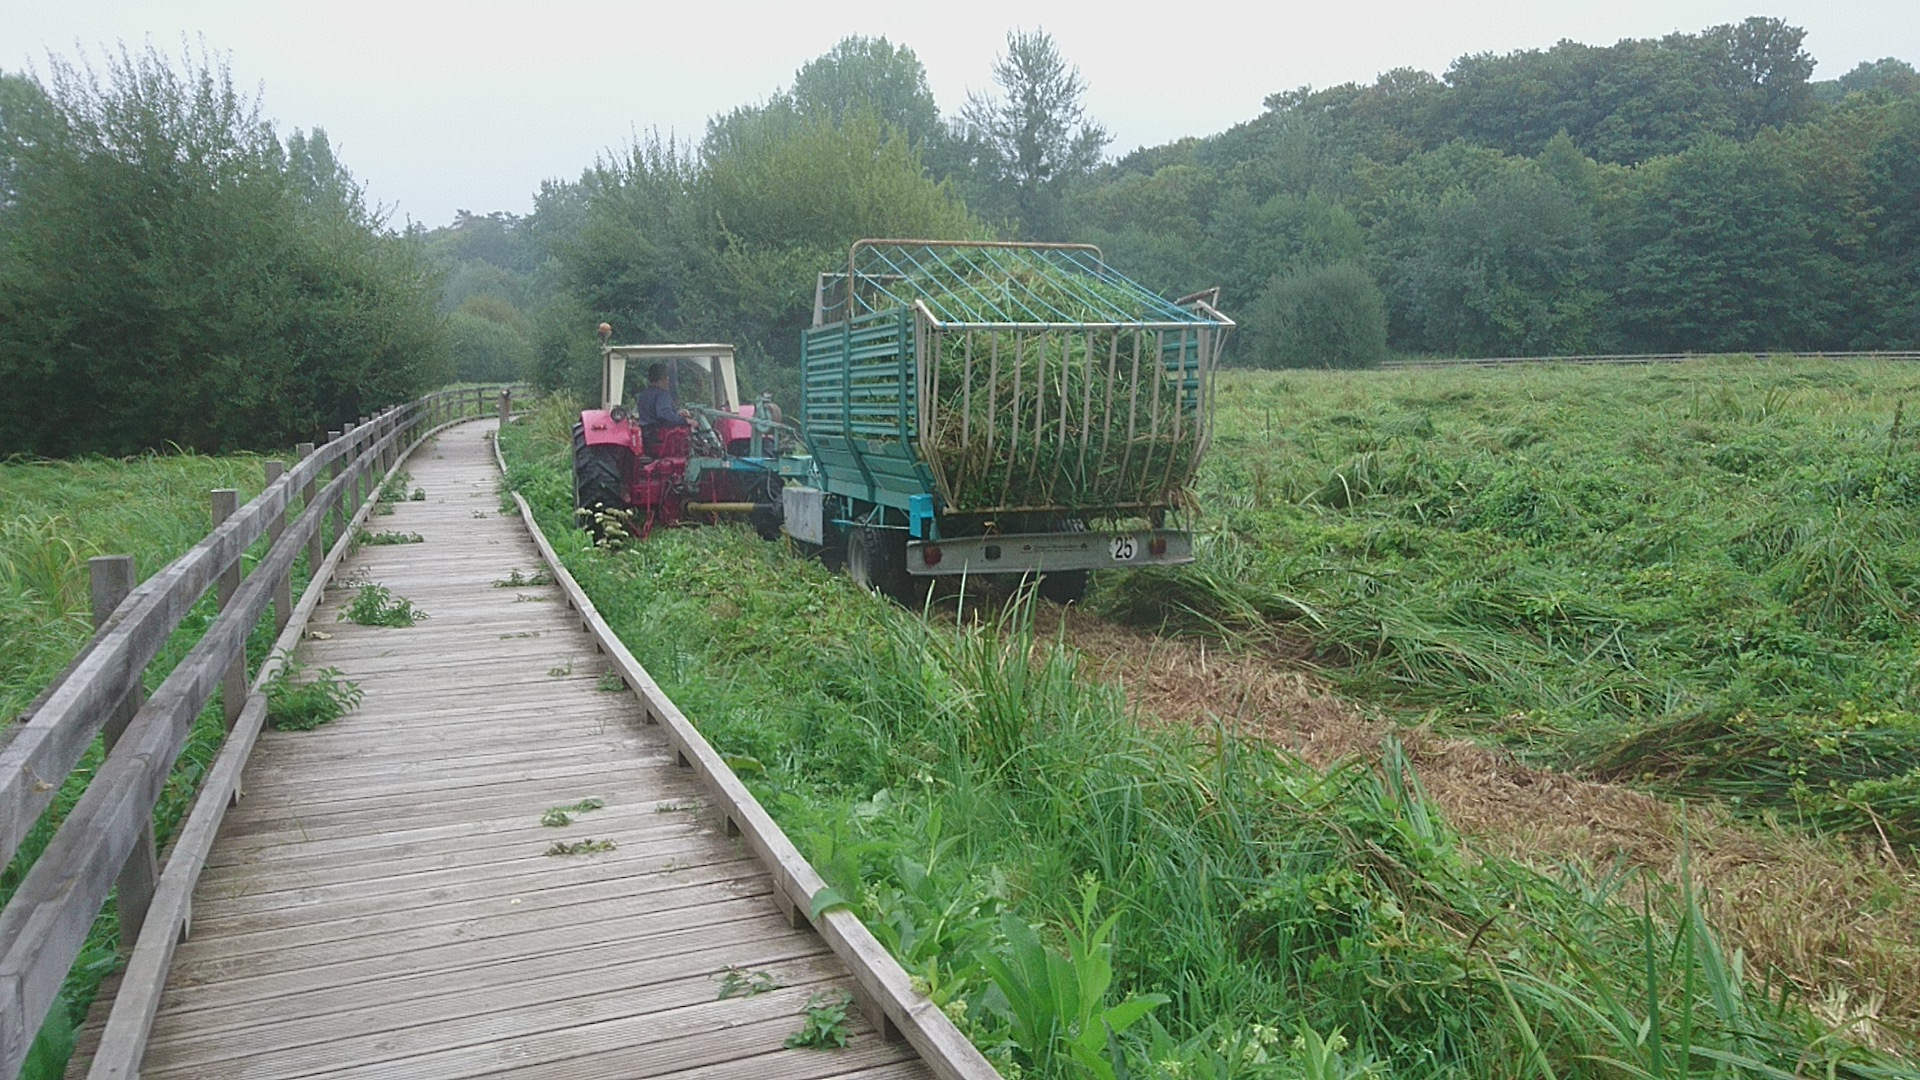 cliché d'un tracteur et sa remorque